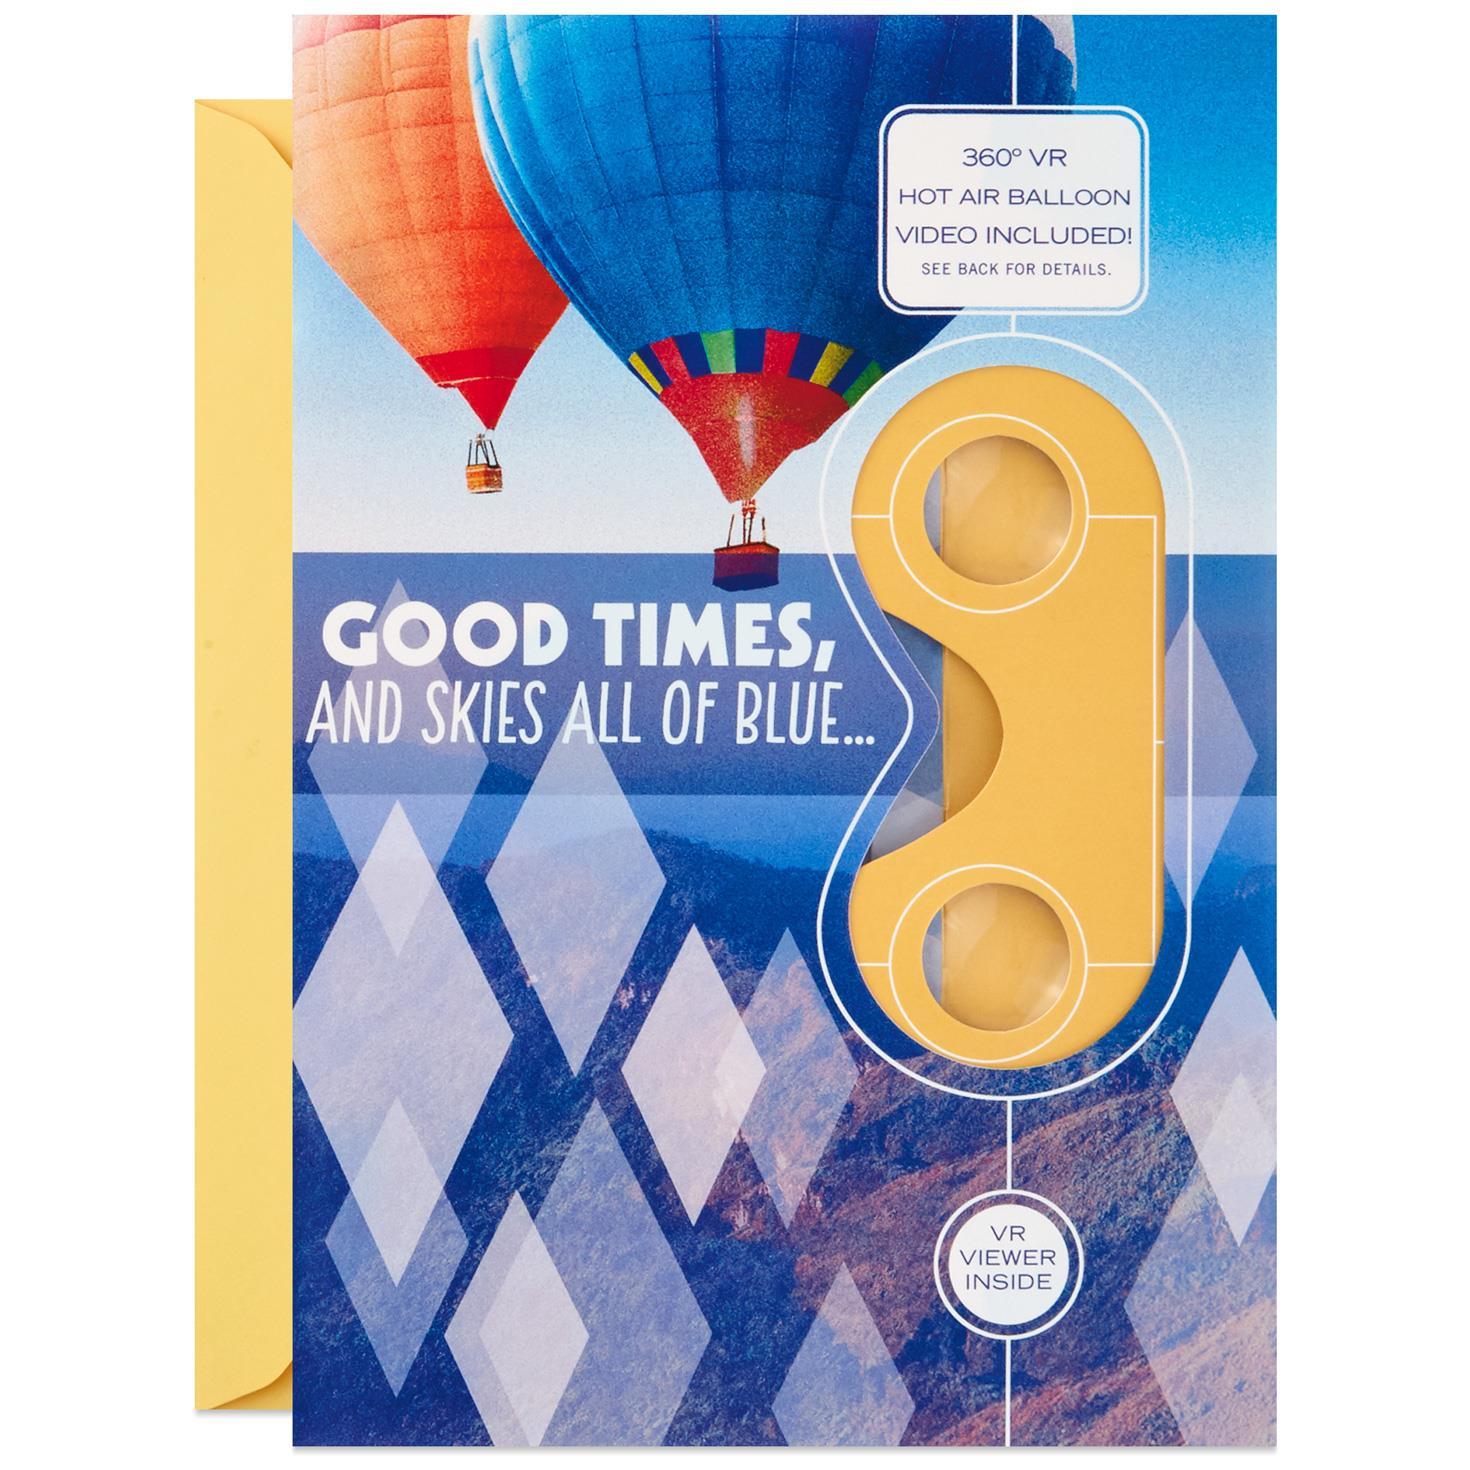 Good Times and Blue Skies Hot Air Balloon VR Birthday Card